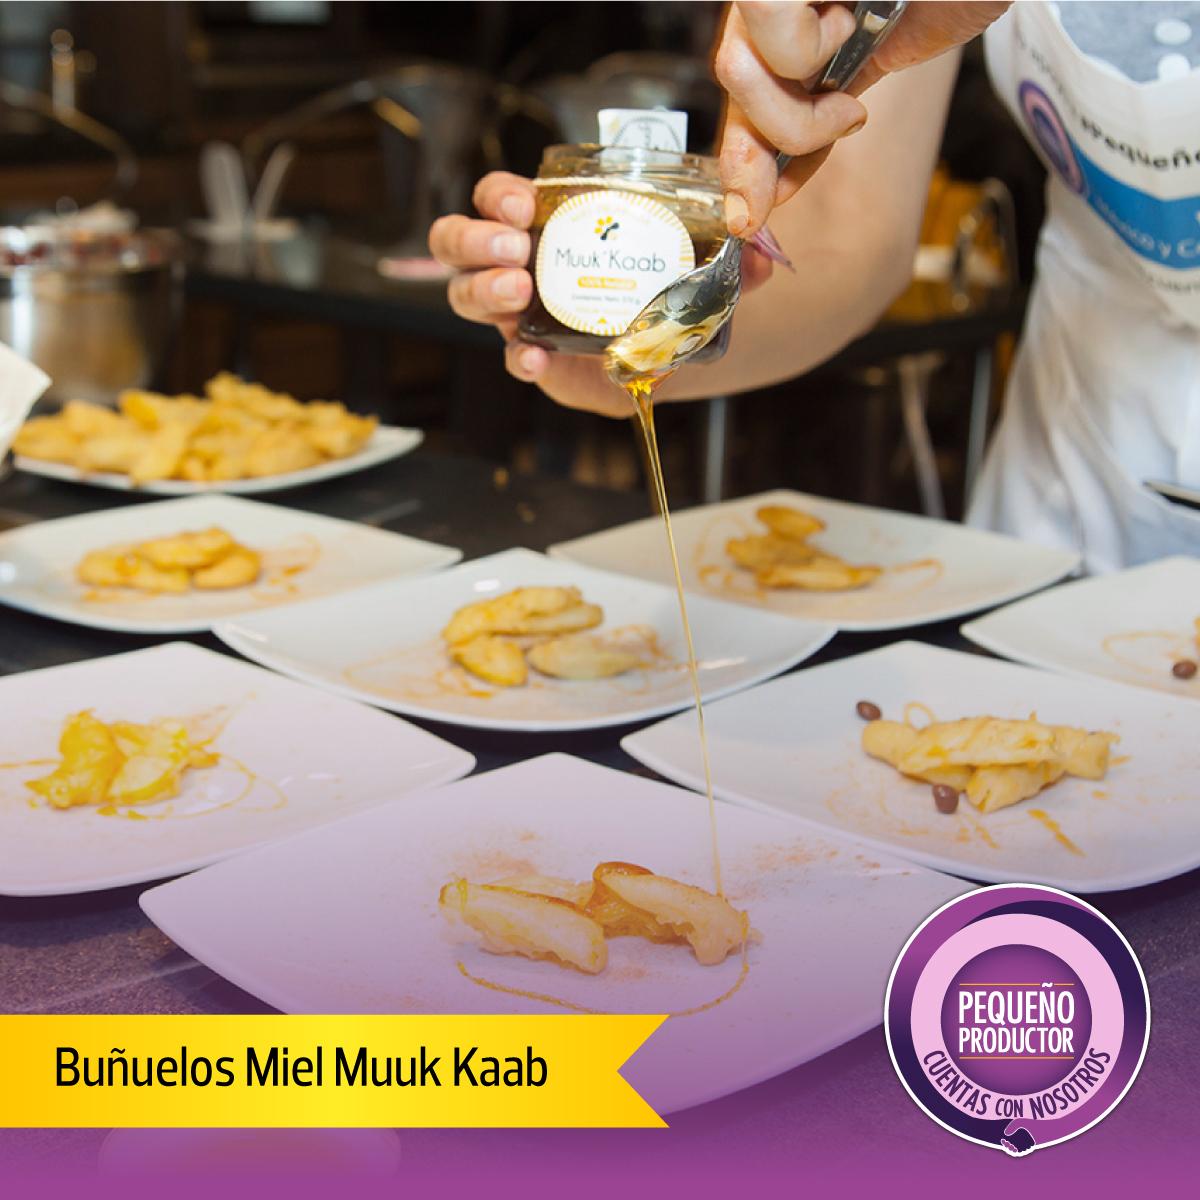 buñuelos con miel muuk kaab